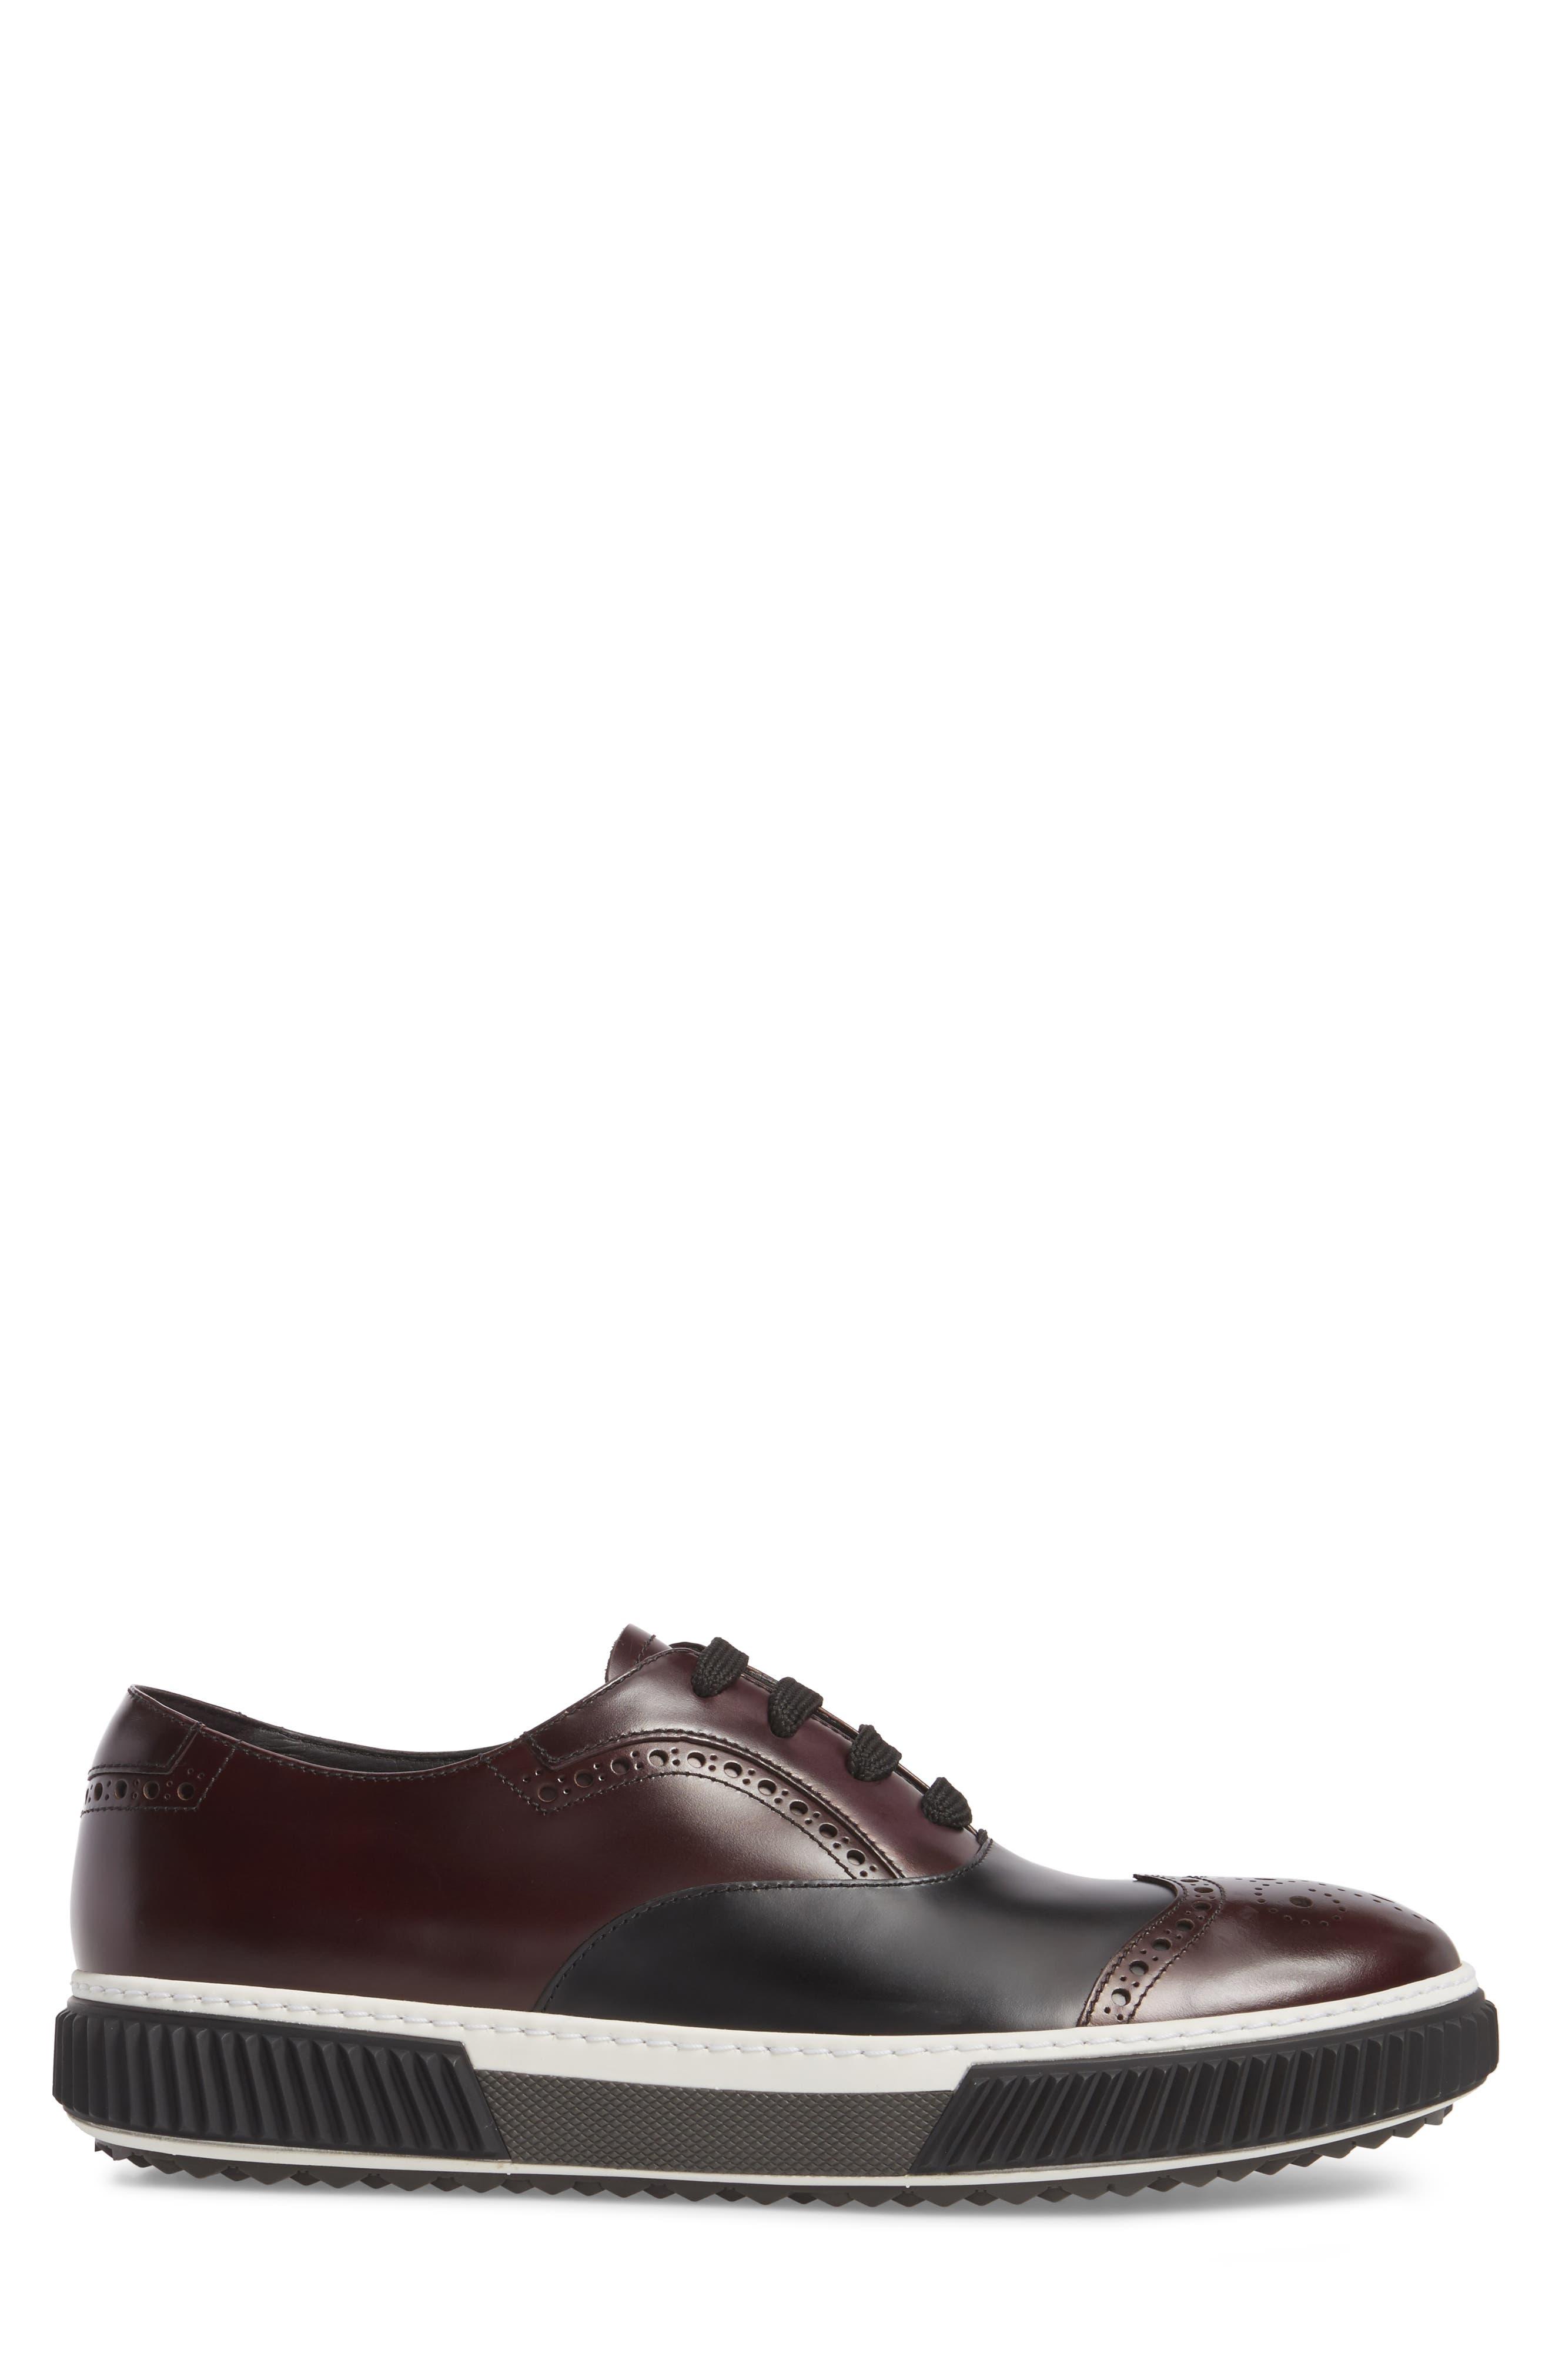 Linea Rossa Wingtip Sneaker,                             Alternate thumbnail 3, color,                             Cordovan Nero